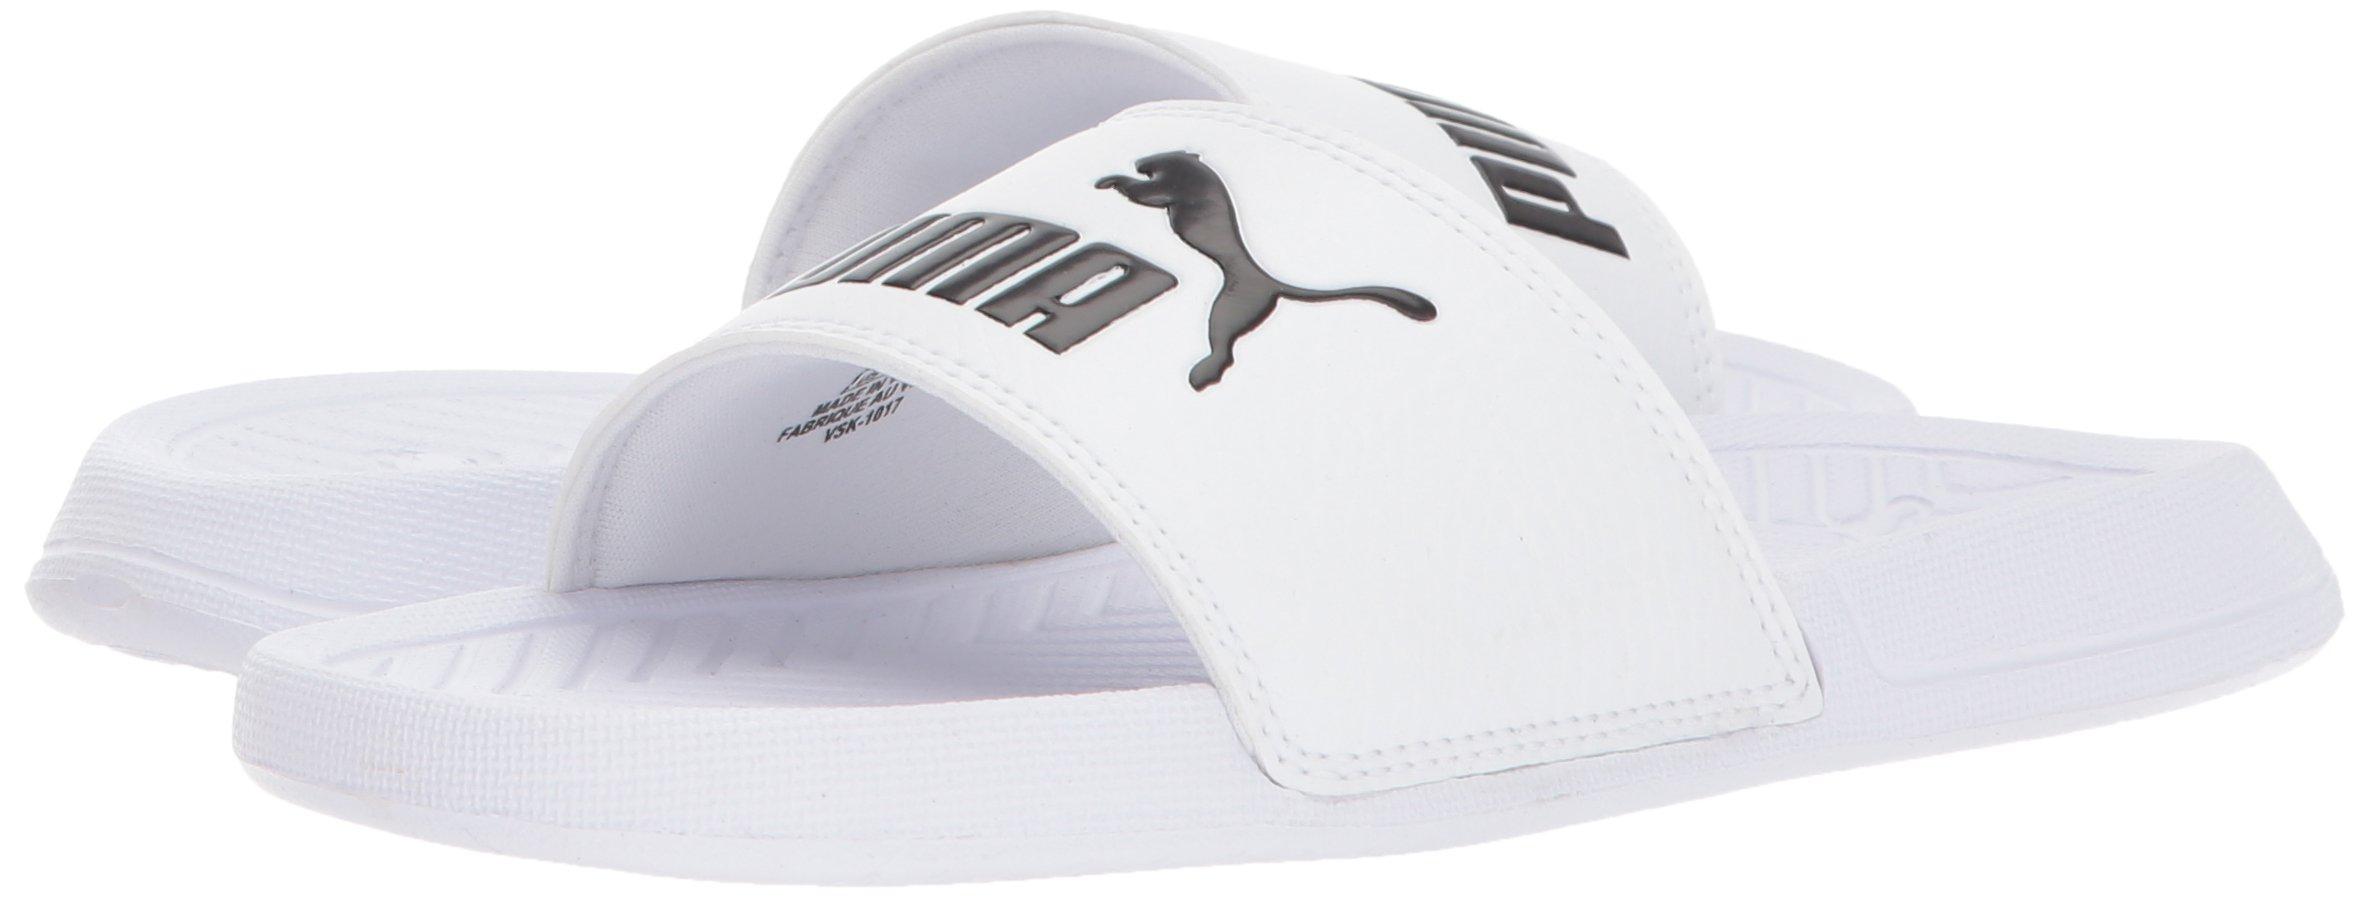 PUMA Puma 365849 03: Unisex Kids Popcat Slide Sandal White